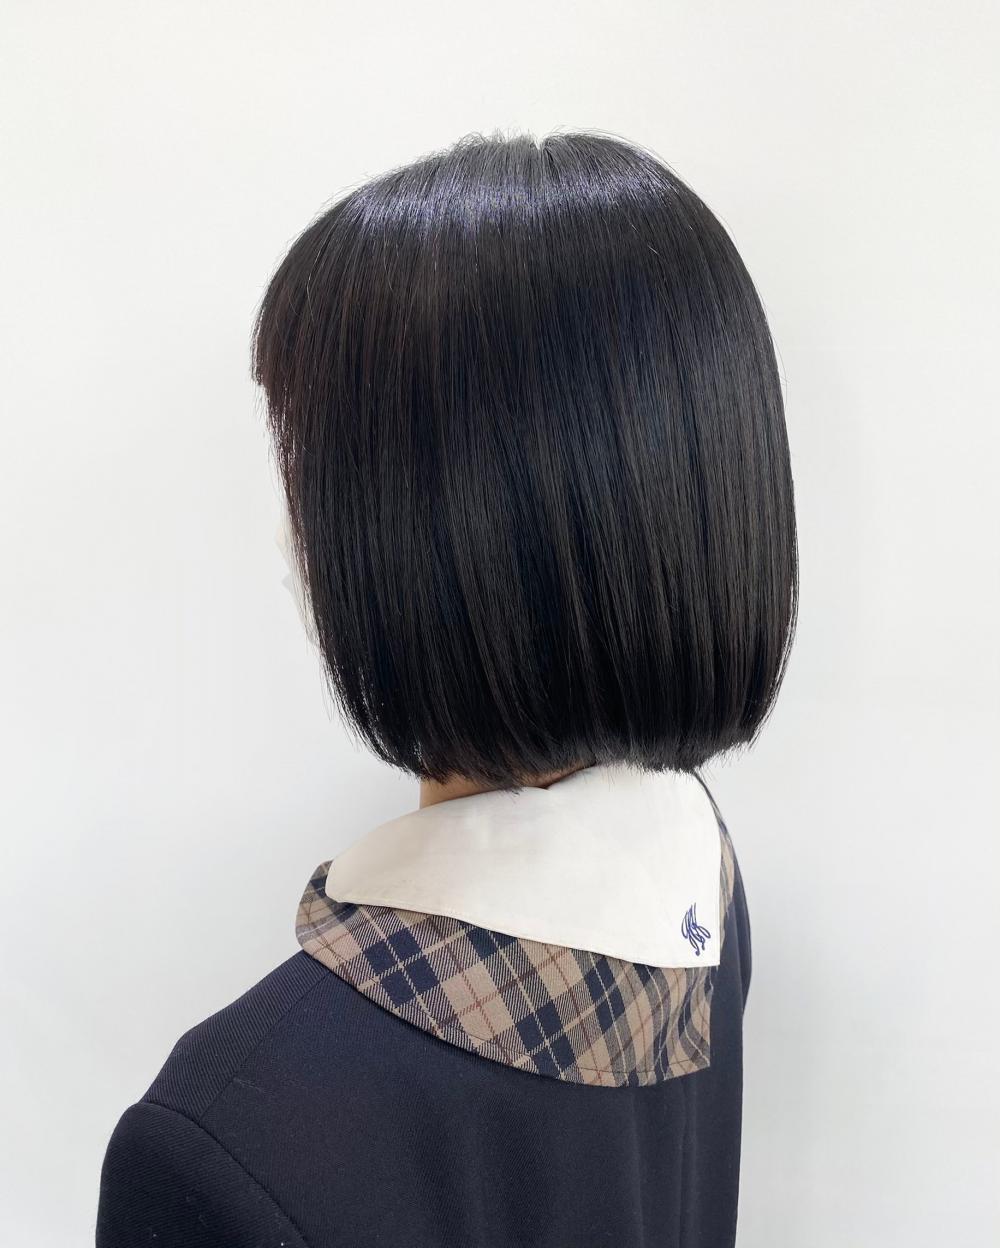 【feliceMICHI間嶋健司】髪質改善ストレートoh